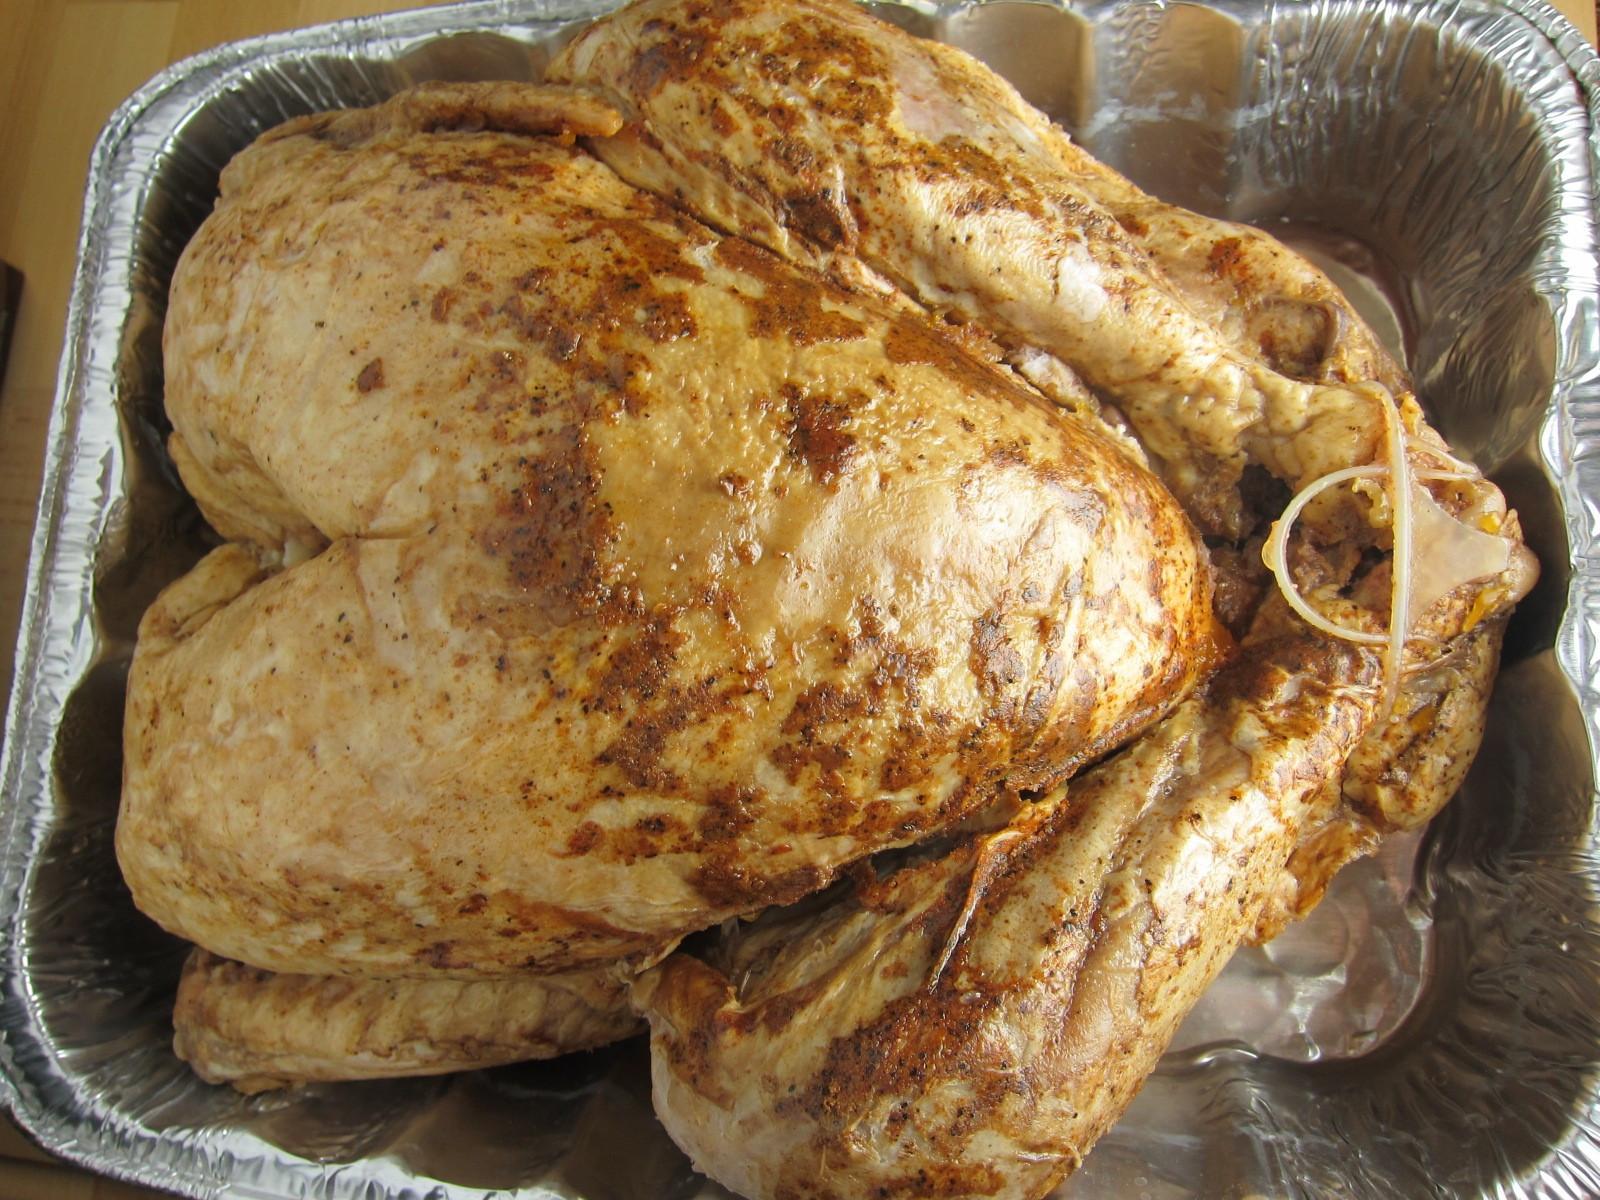 Bojangles Thanksgiving Turkey  Bojangles Thanksgiving Turkey – Festival Collections